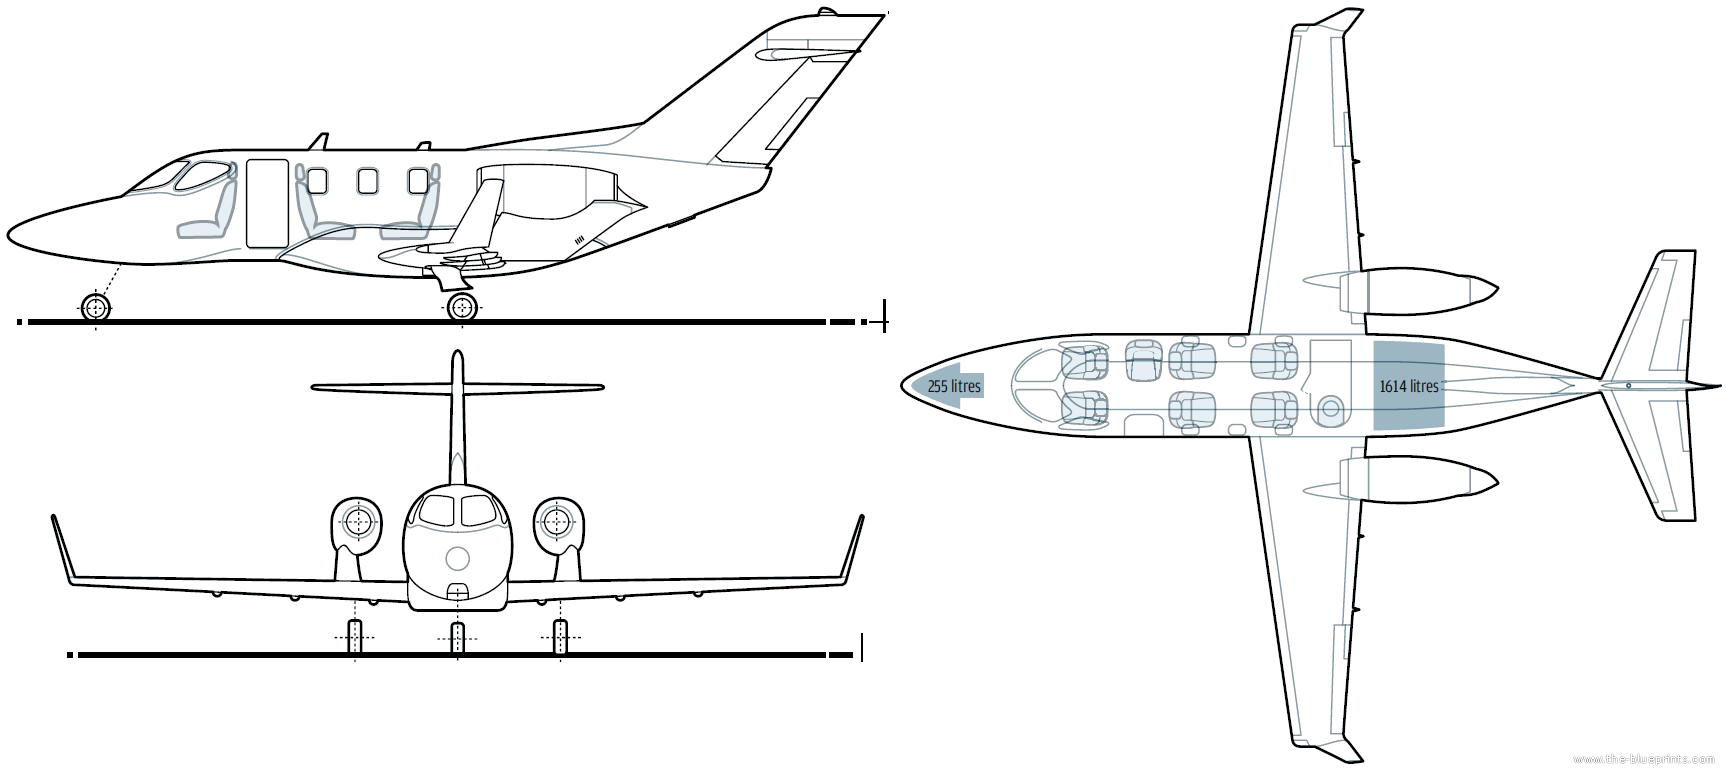 Blueprints modern airplanes modern h hondajet hondajet malvernweather Images